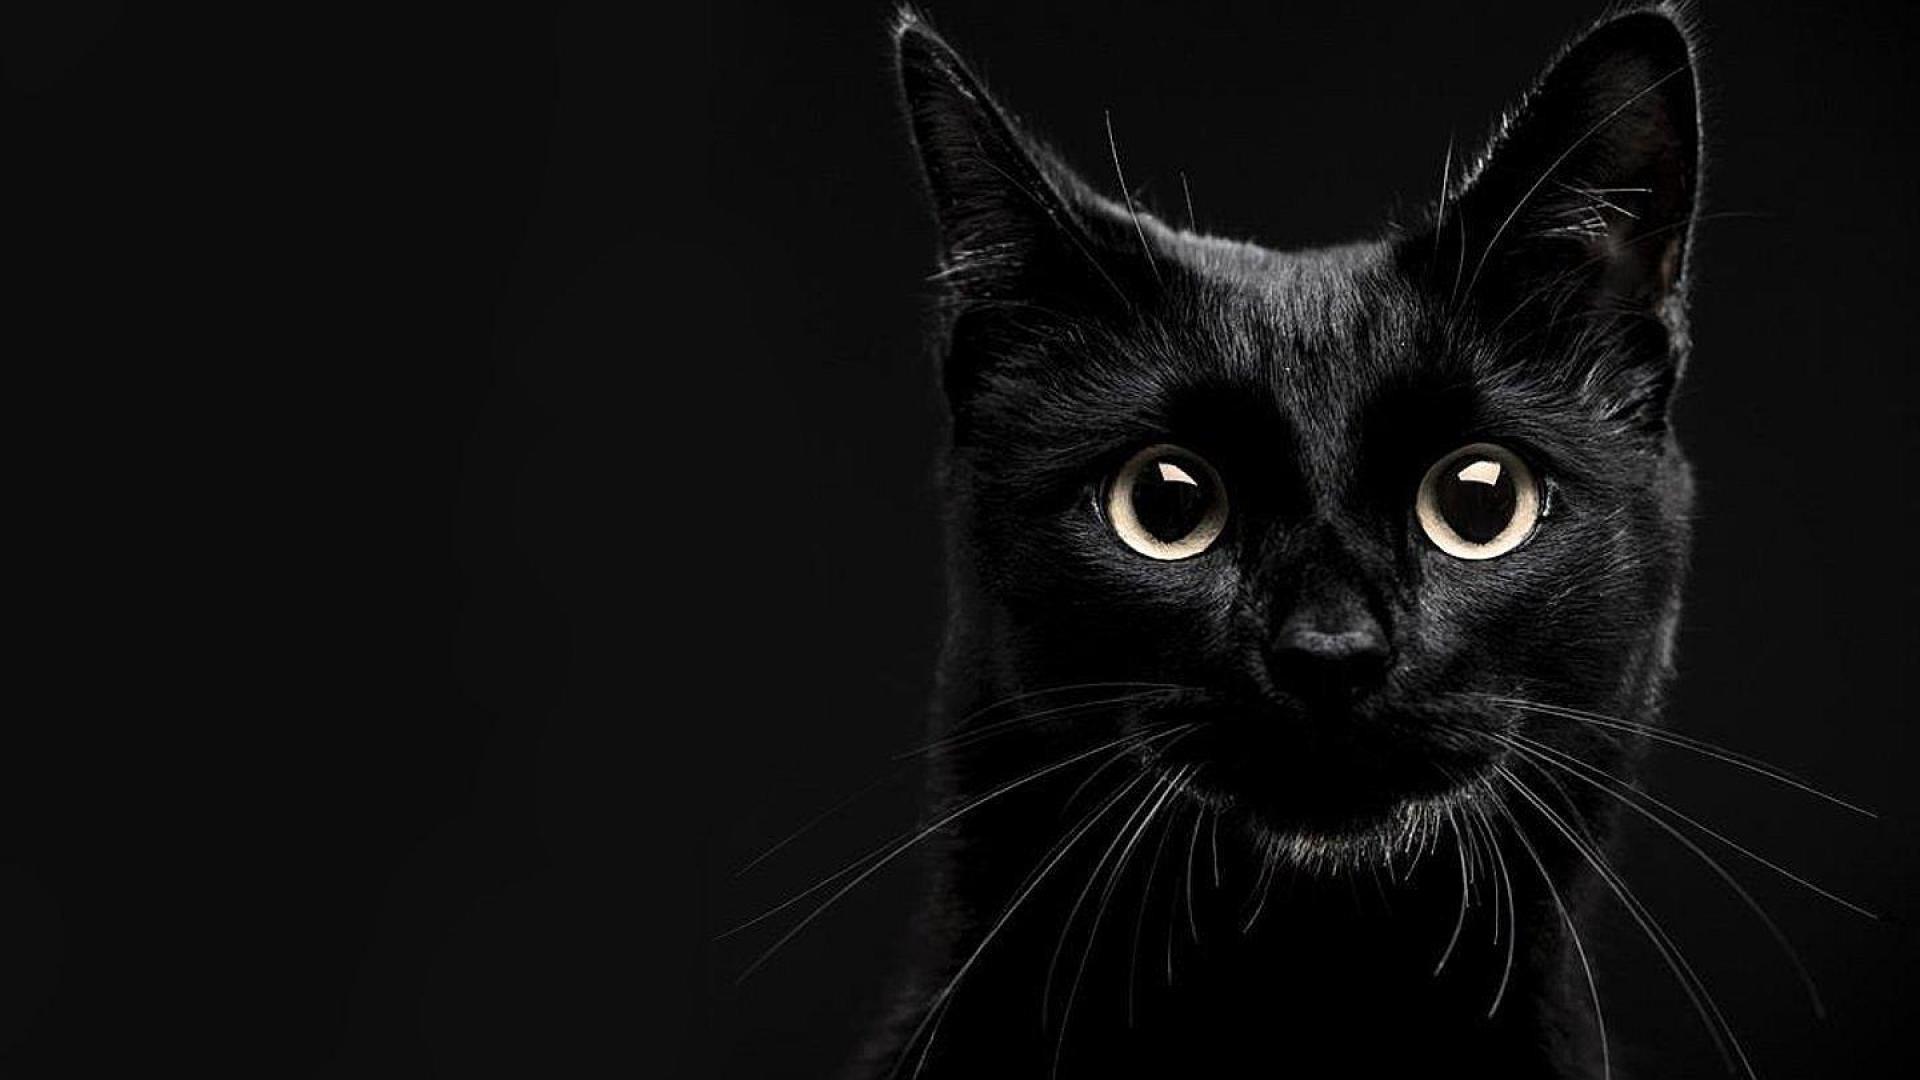 Black Cat Wallpaper Iphone 7 Best Hd Wallpaper